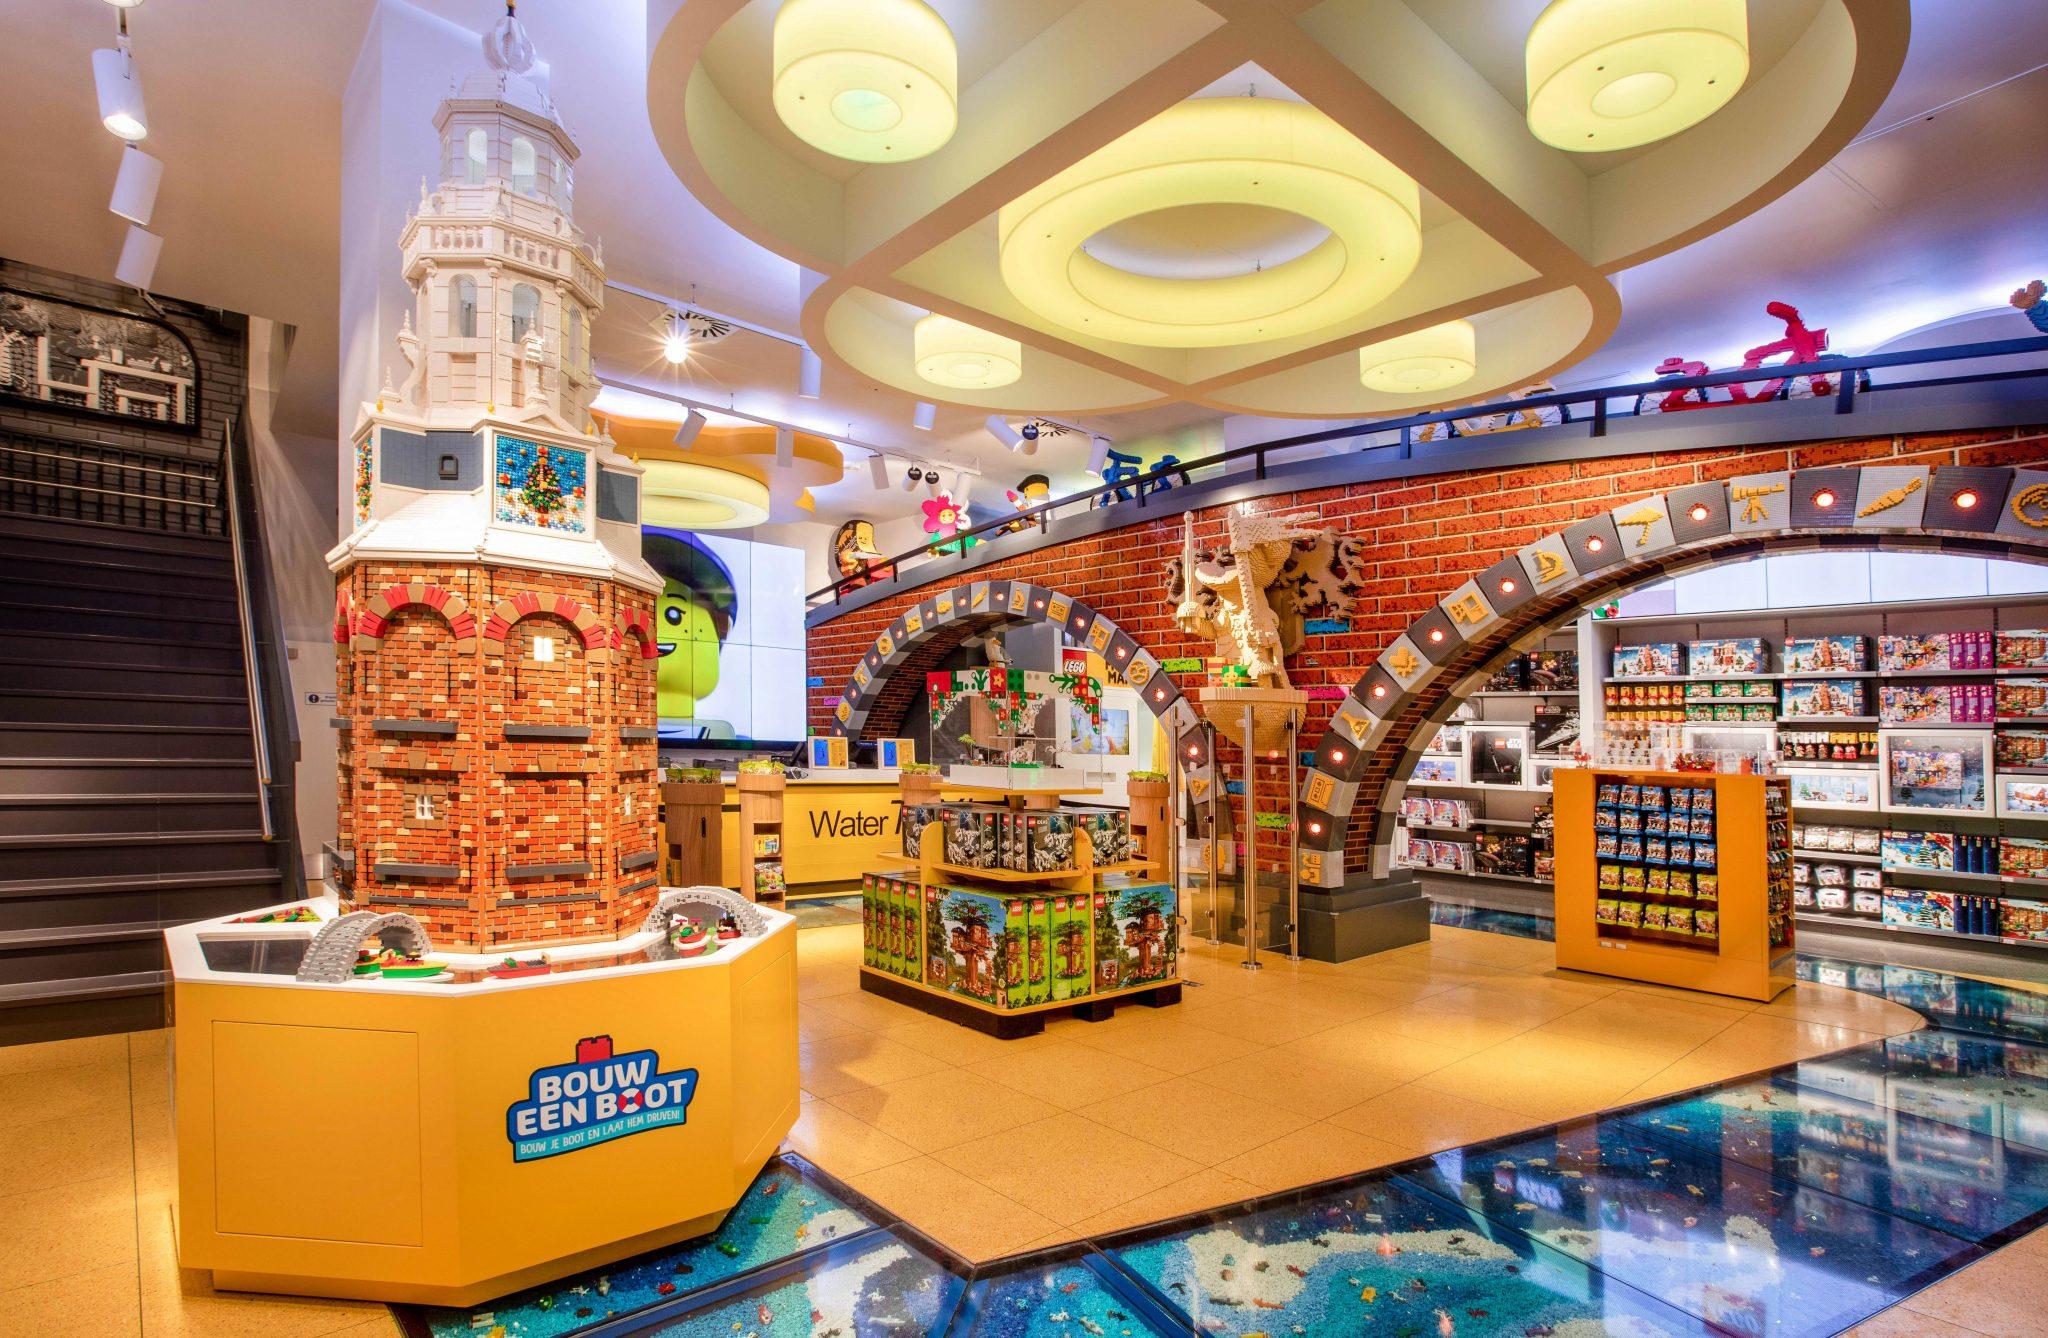 LEGO flagship store Amsterdam; Wat is er te doen en opening winkel - Mamaliefde.nl